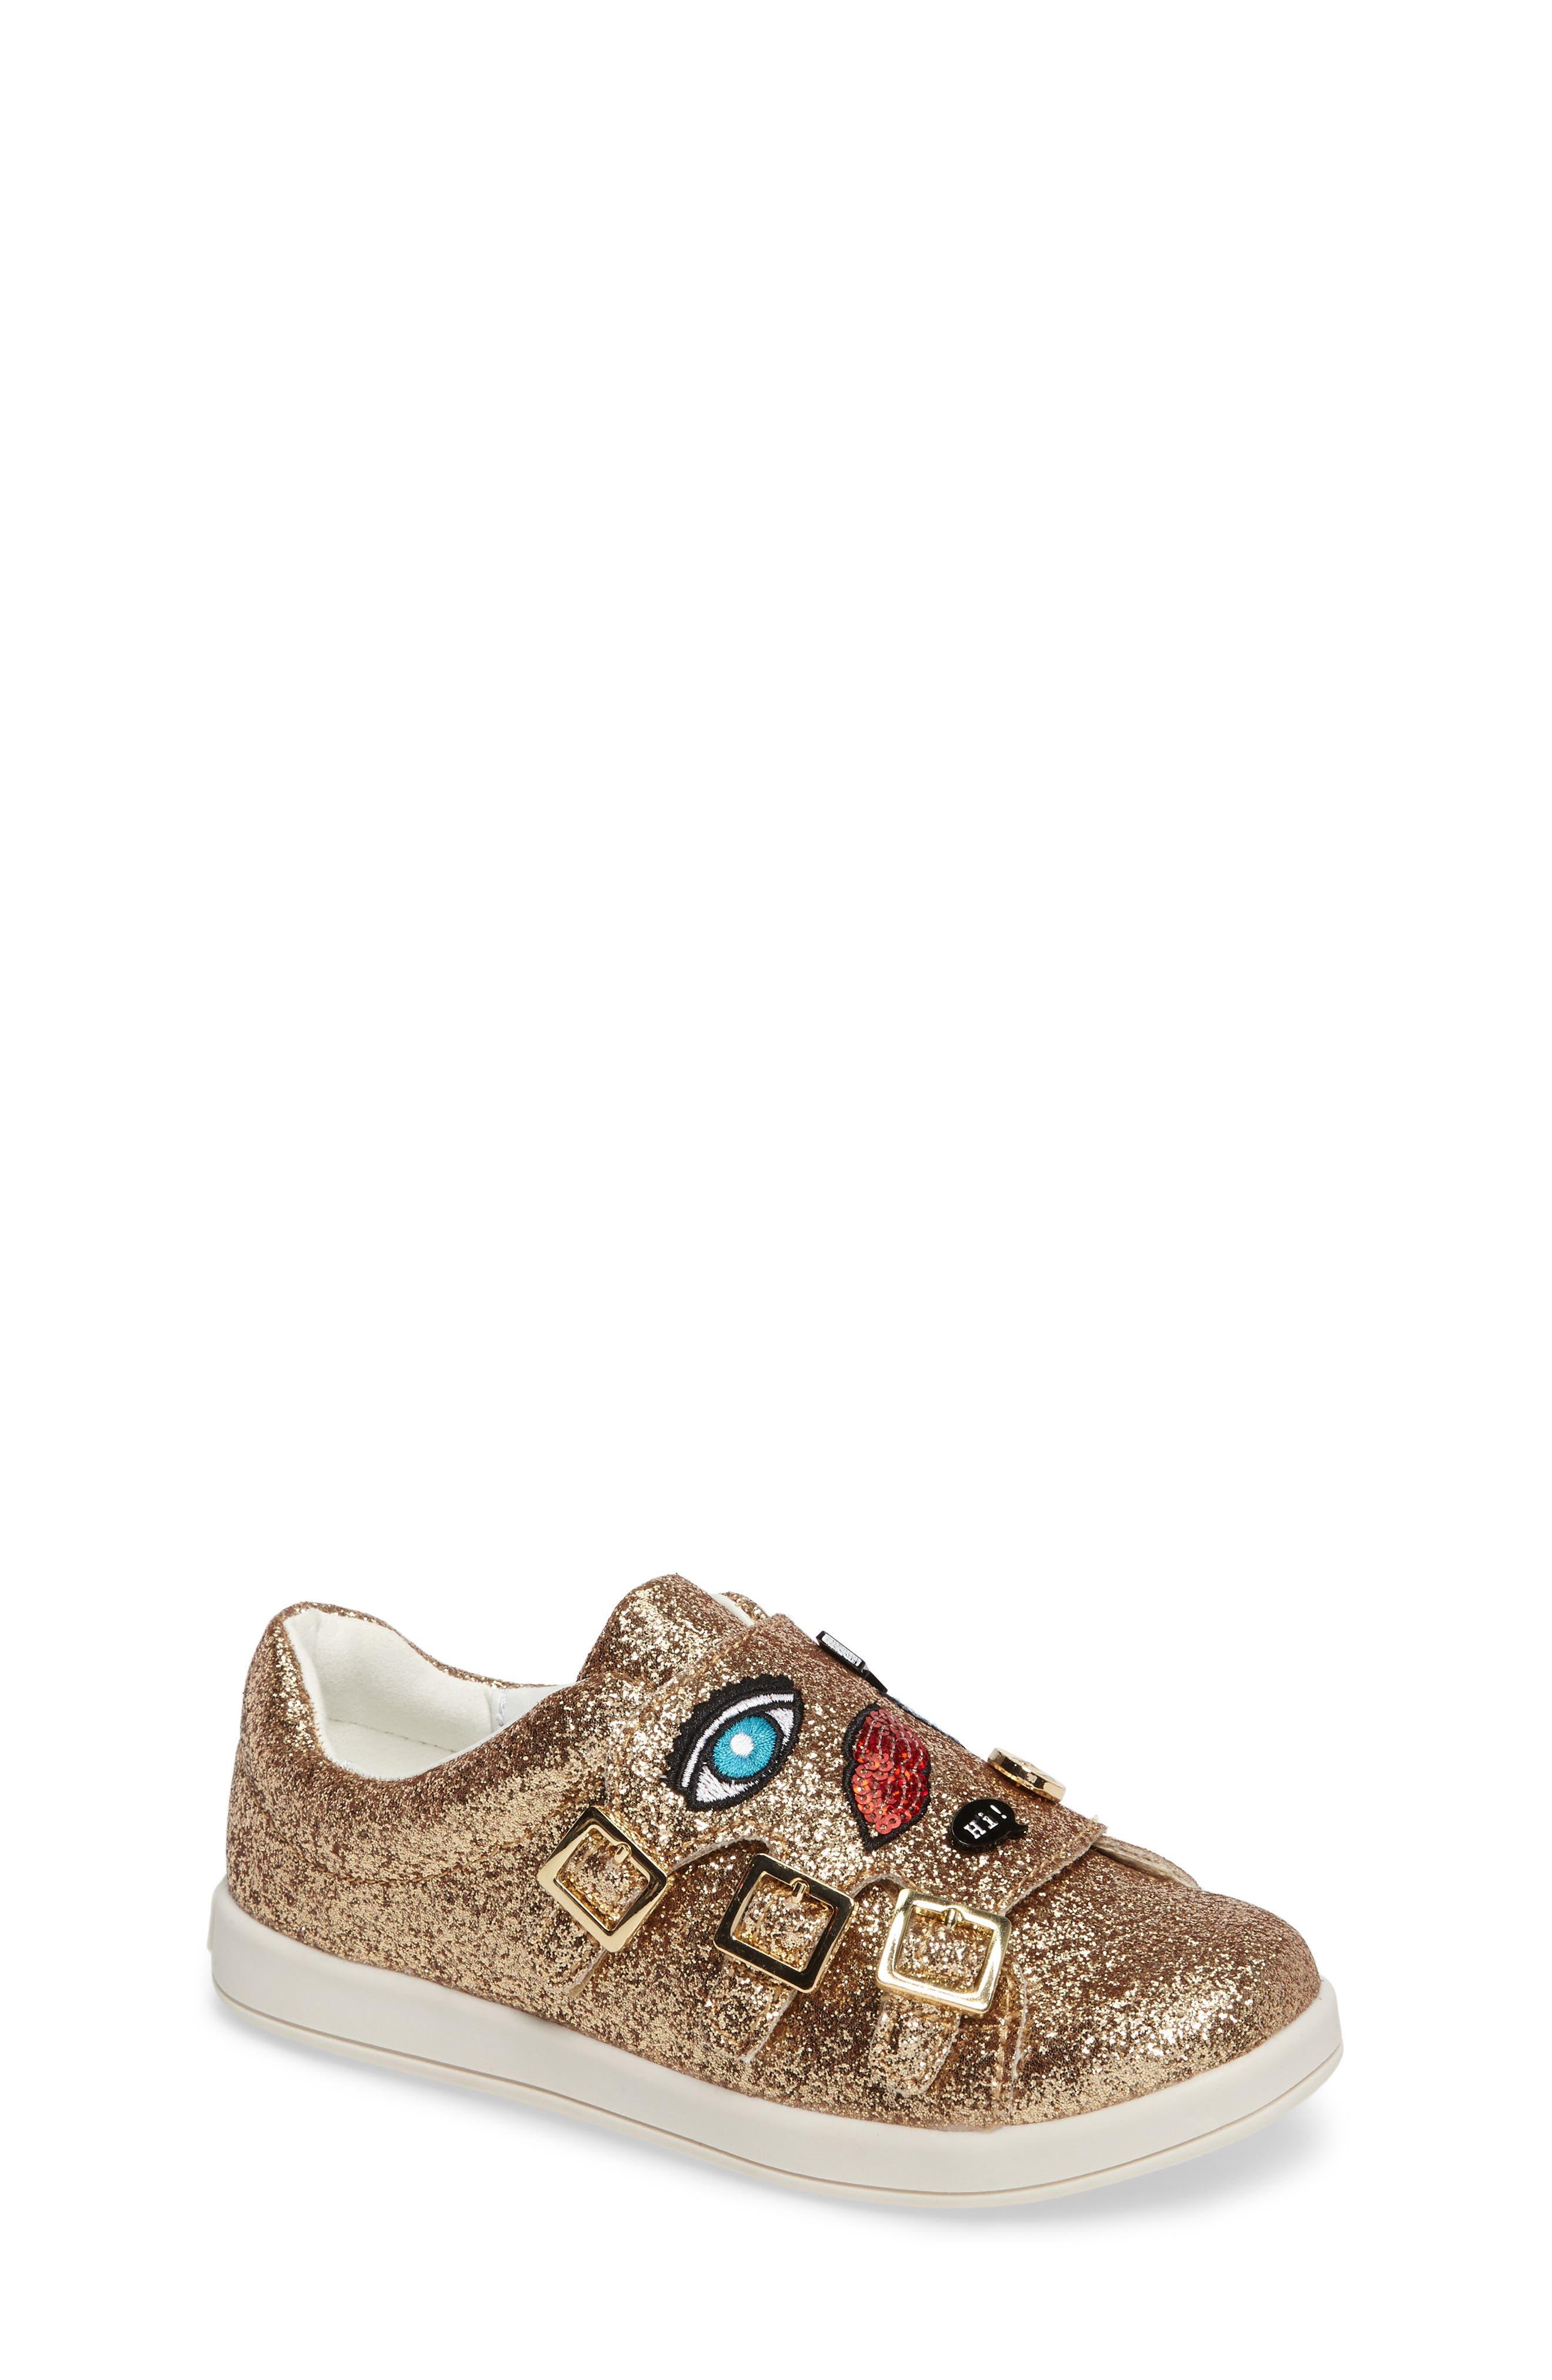 Liv Wendy Glitter Emoji Sneaker,                         Main,                         color, 710